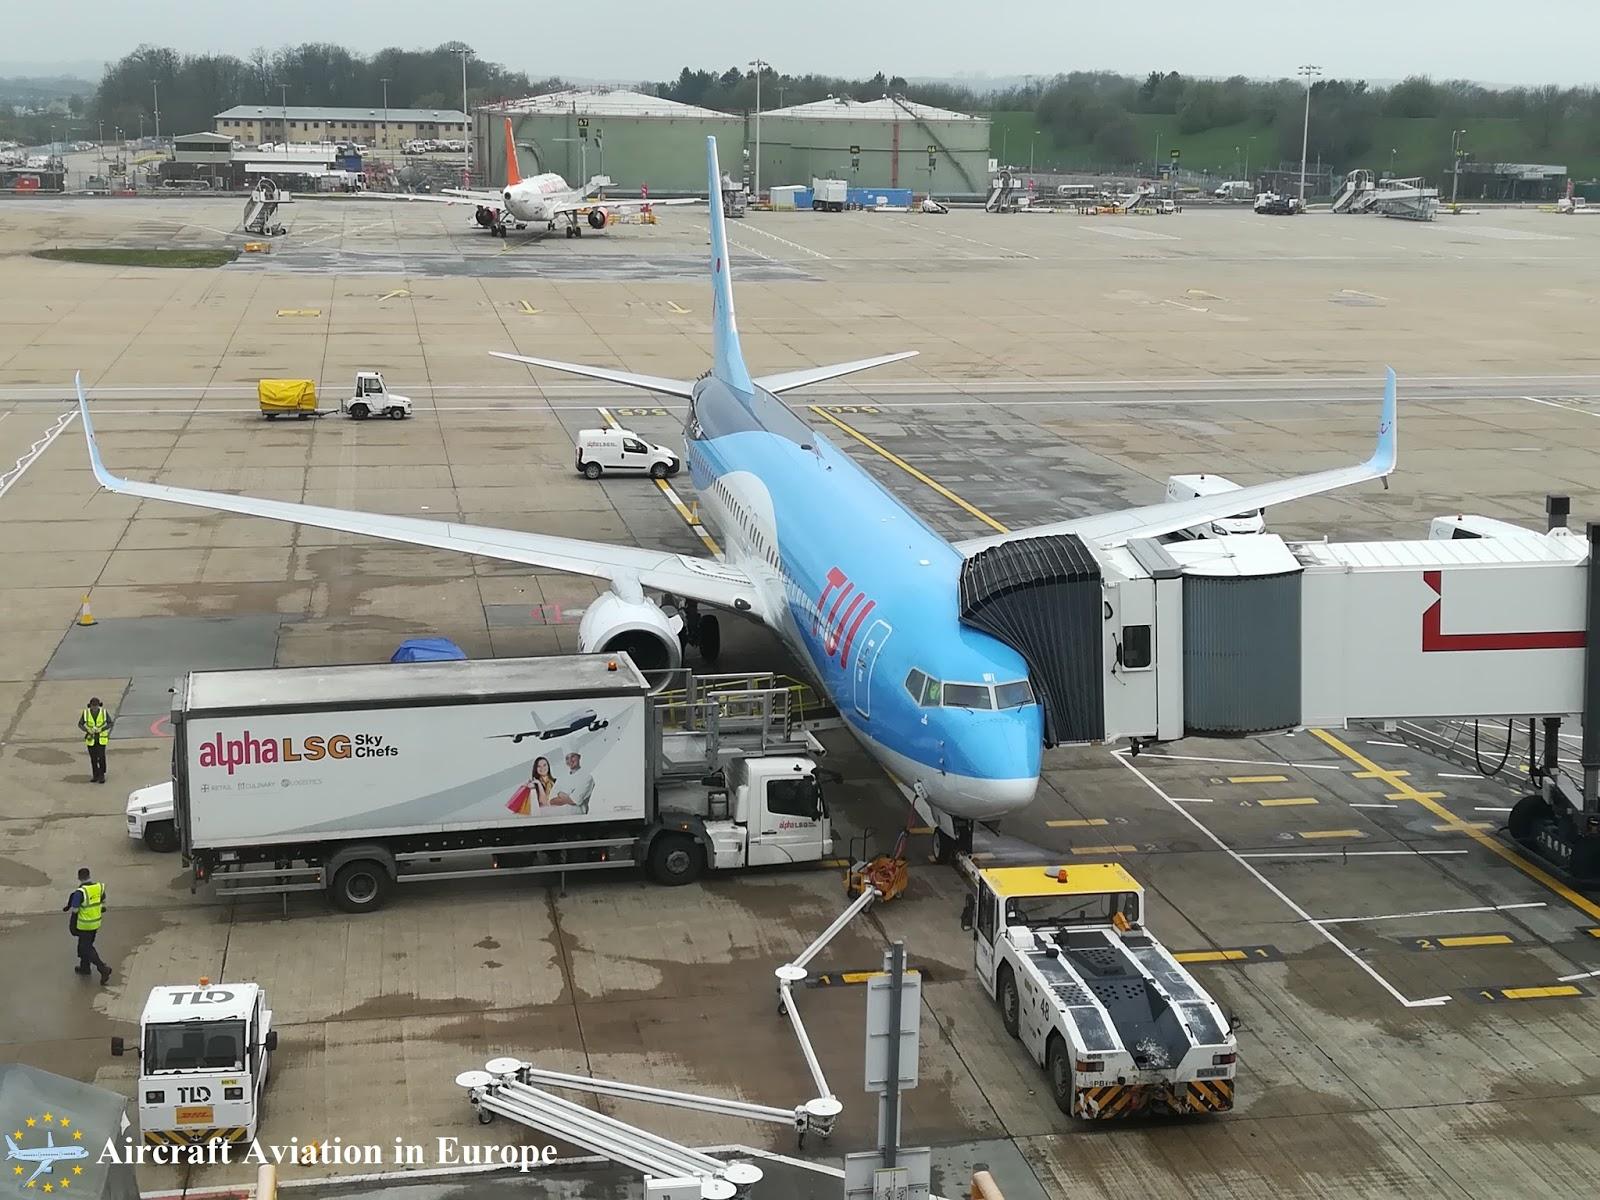 Aircraft Aviation in Europe: My flight report TUI Airways